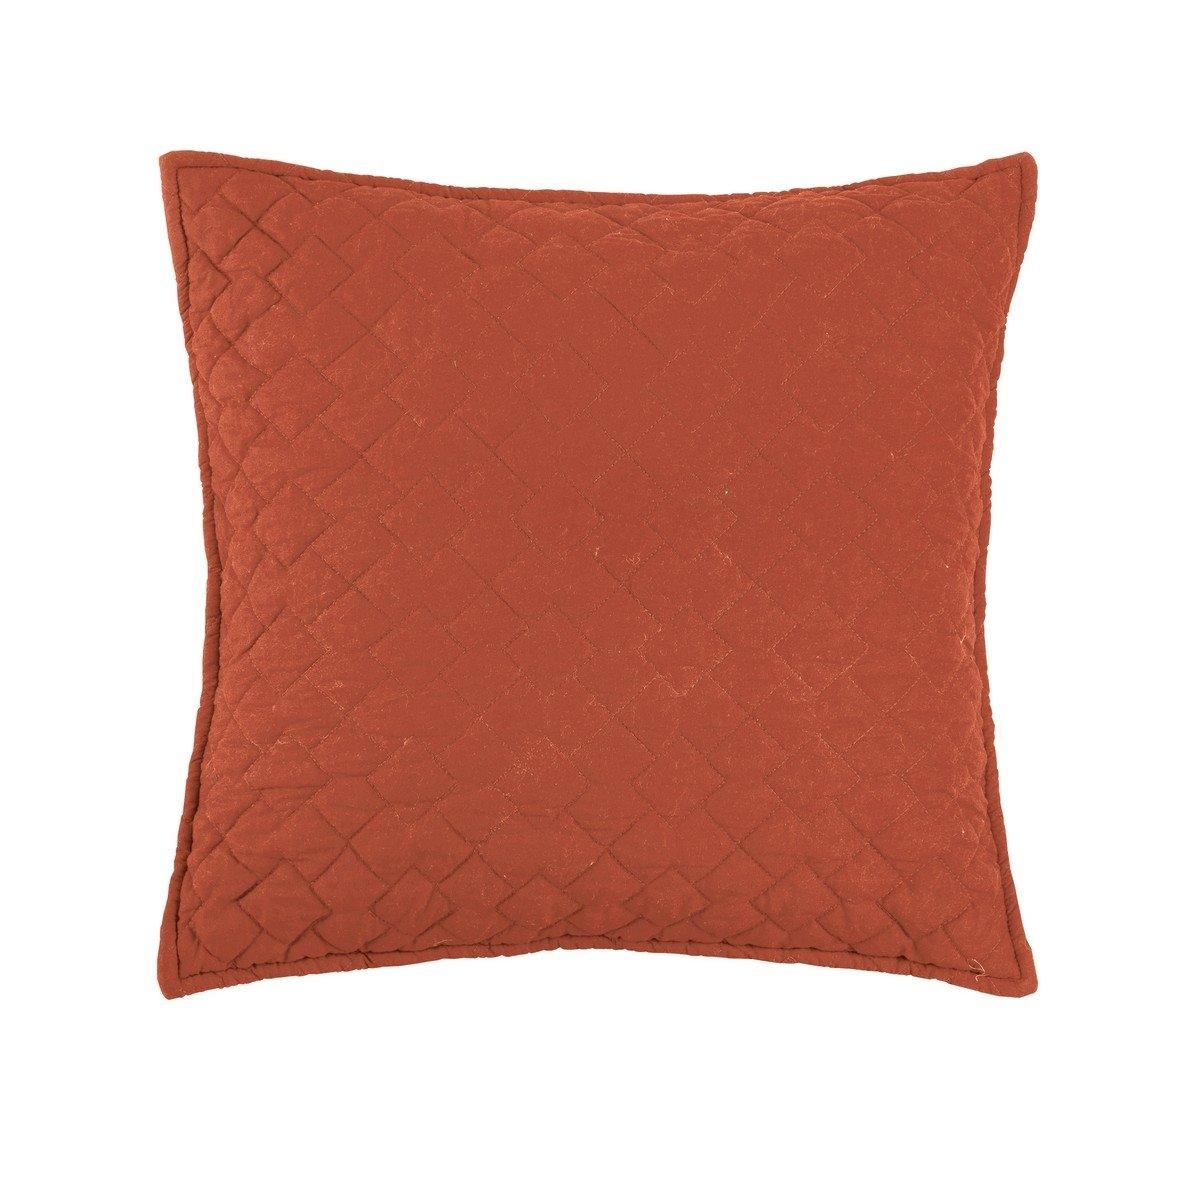 Regent Paprika Quilted Pillow